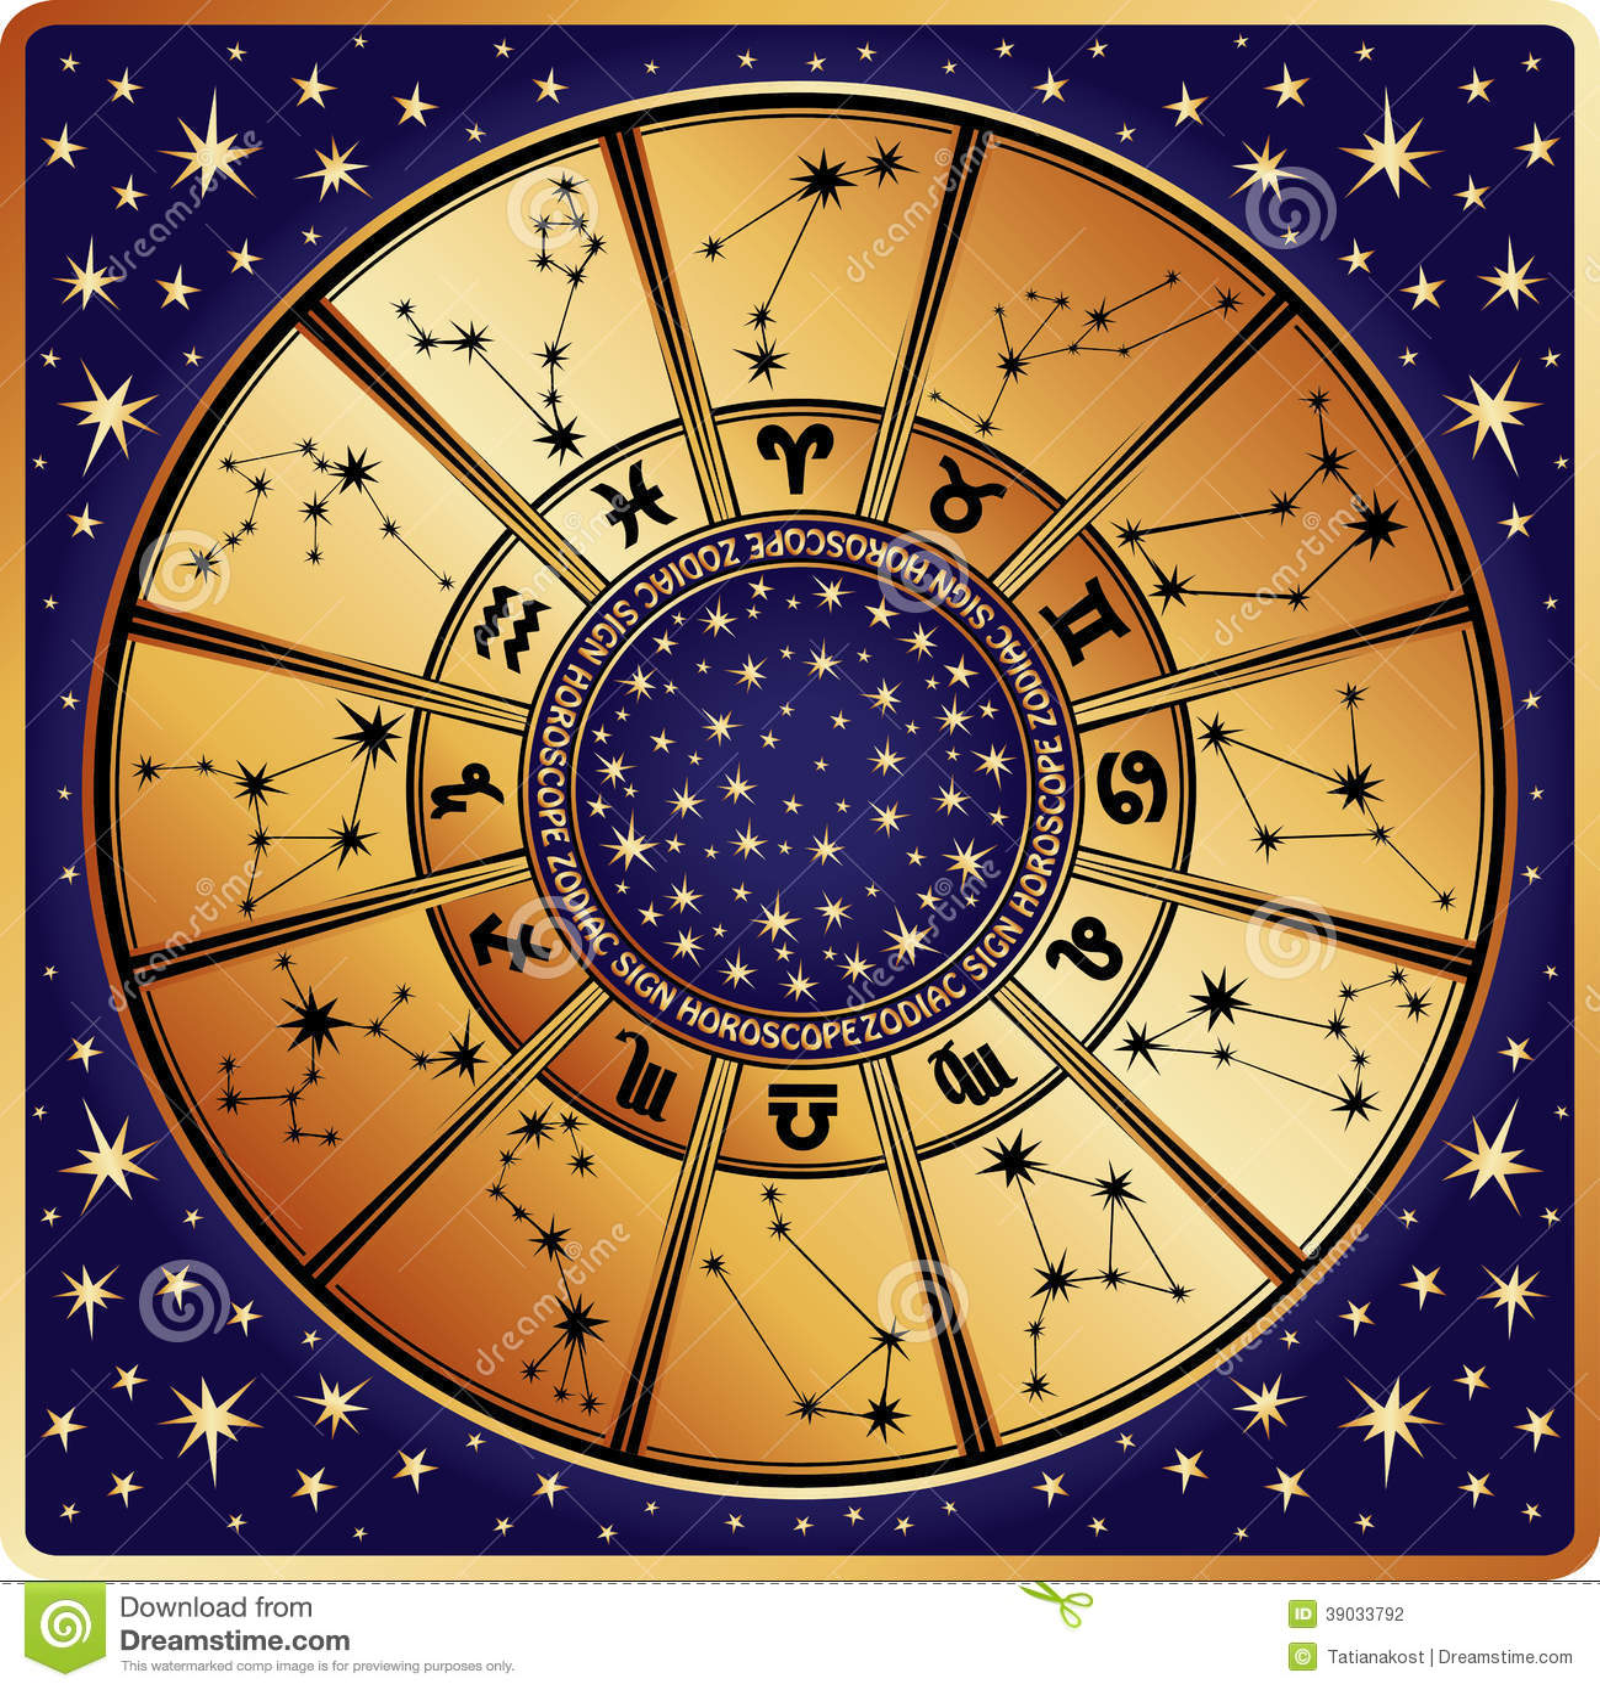 znaki-zodiaka-izvrashentsi